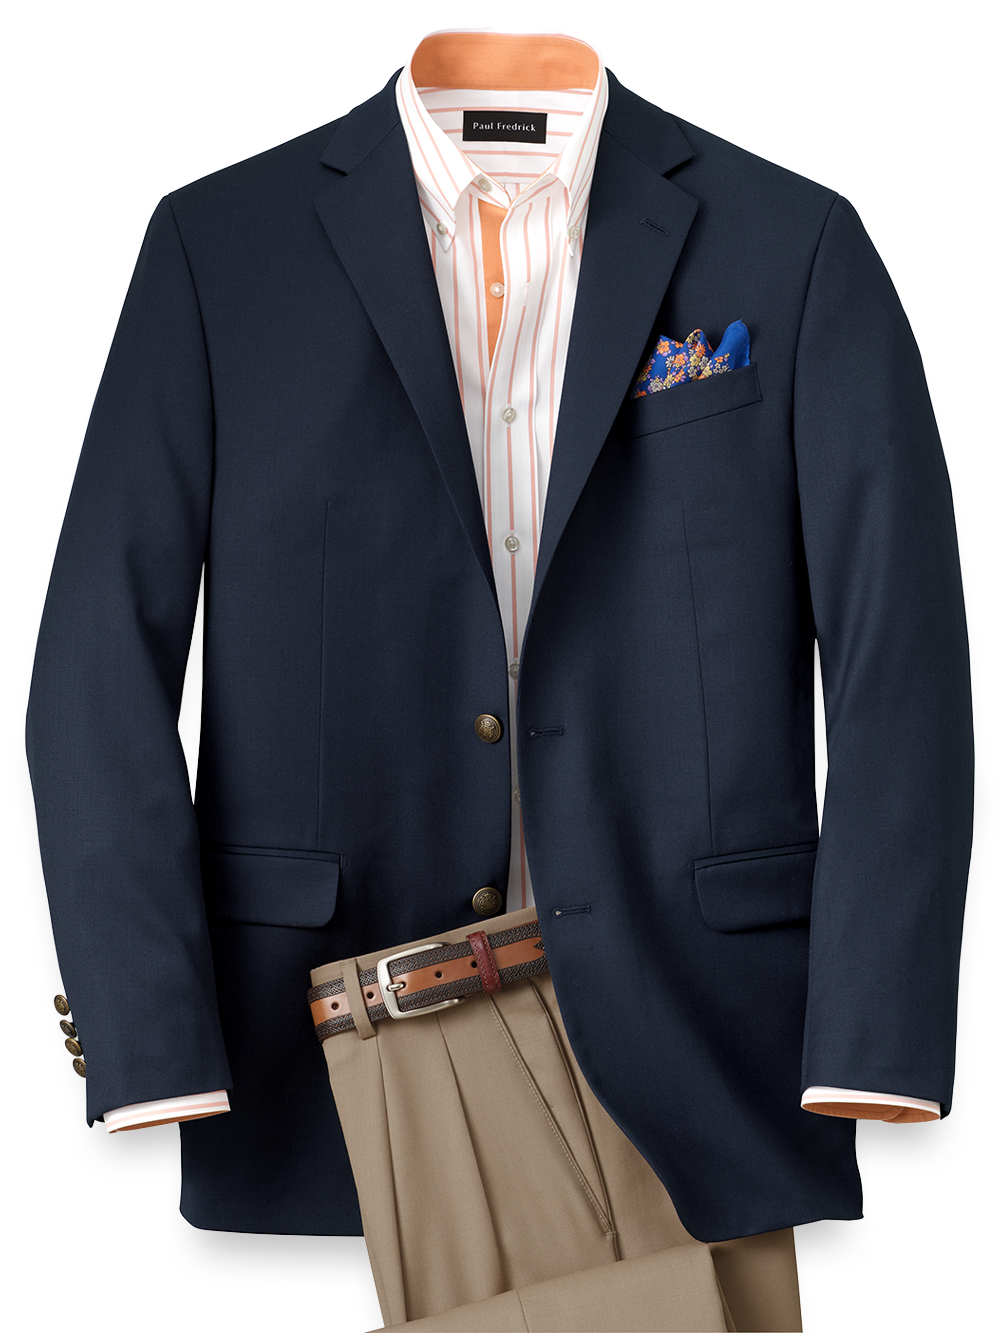 4d0281409a0a Pure Wool Travel Blazer | Paul Fredrick